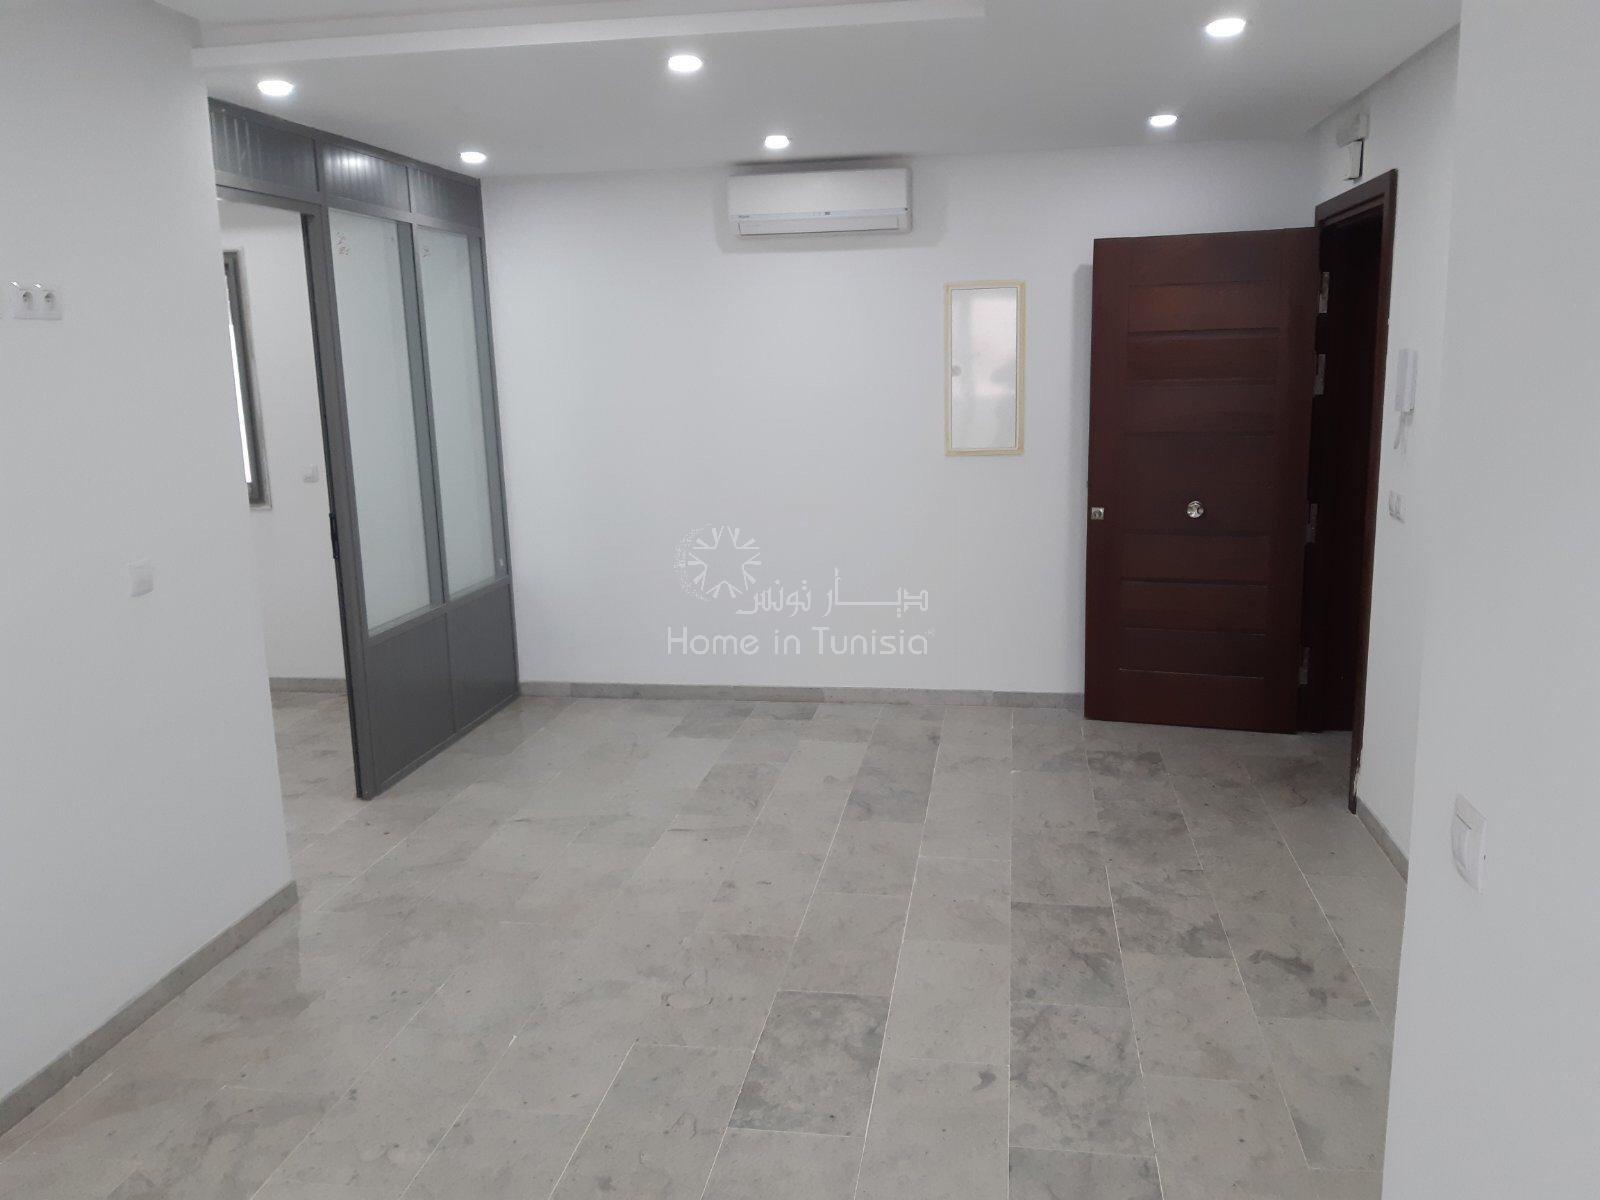 Sale Office - Cité Sahloul - Tunisia